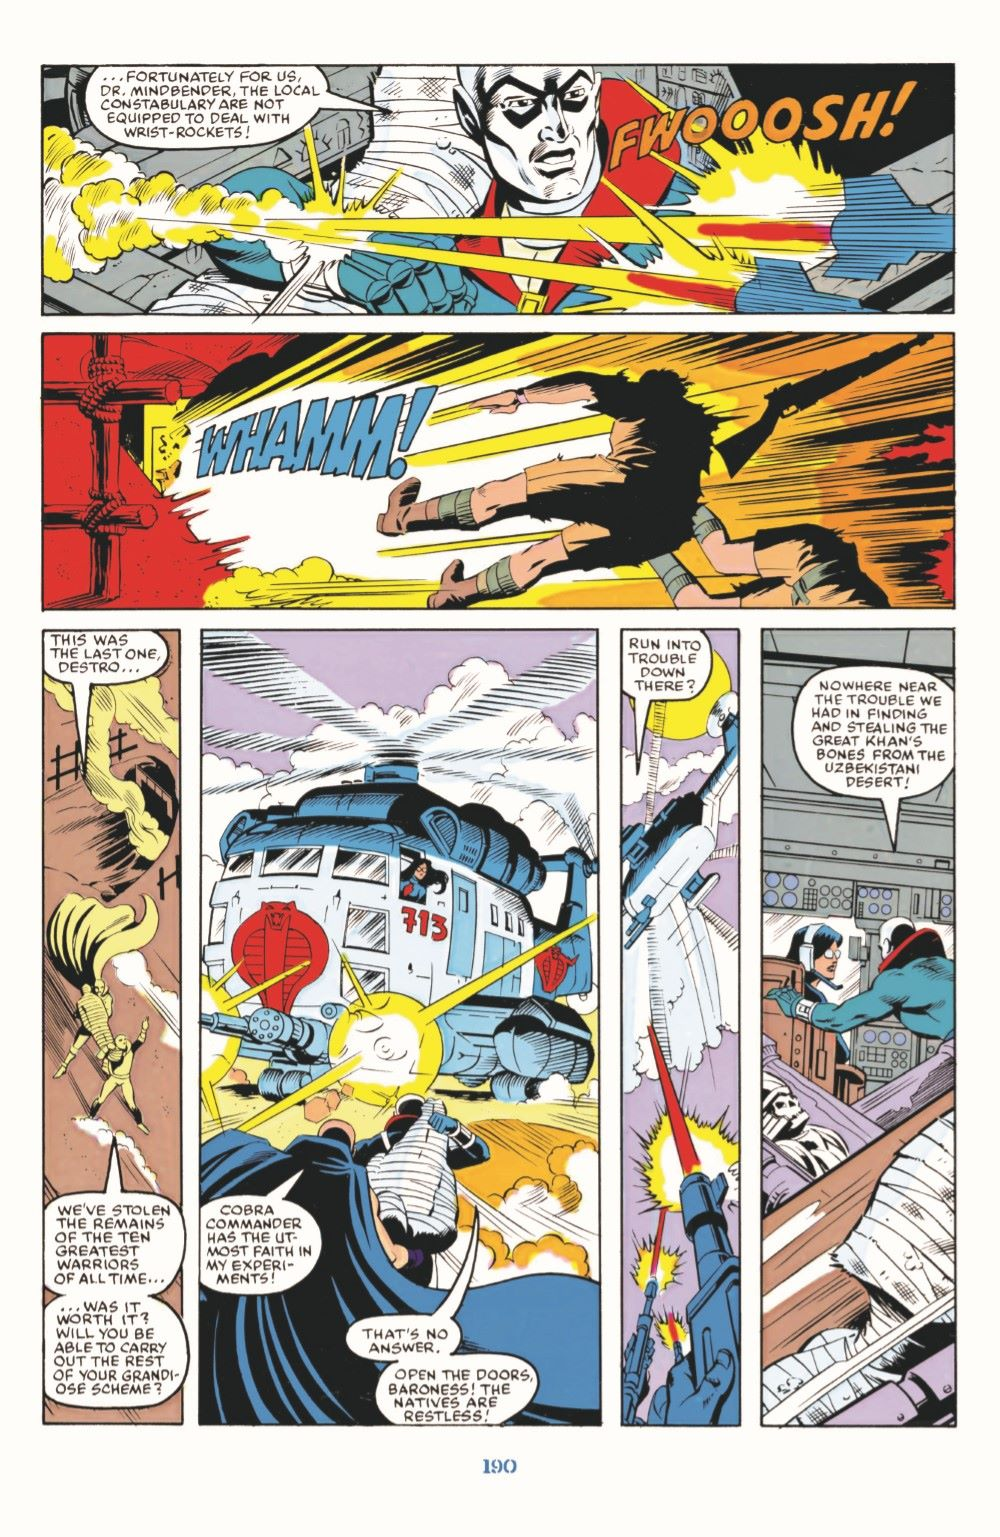 GIJoeRAH_SerpentorUncoiled-pr-05 ComicList Previews: G.I. JOE A REAL AMERICAN HERO SERPENTOR UNCOILED #1